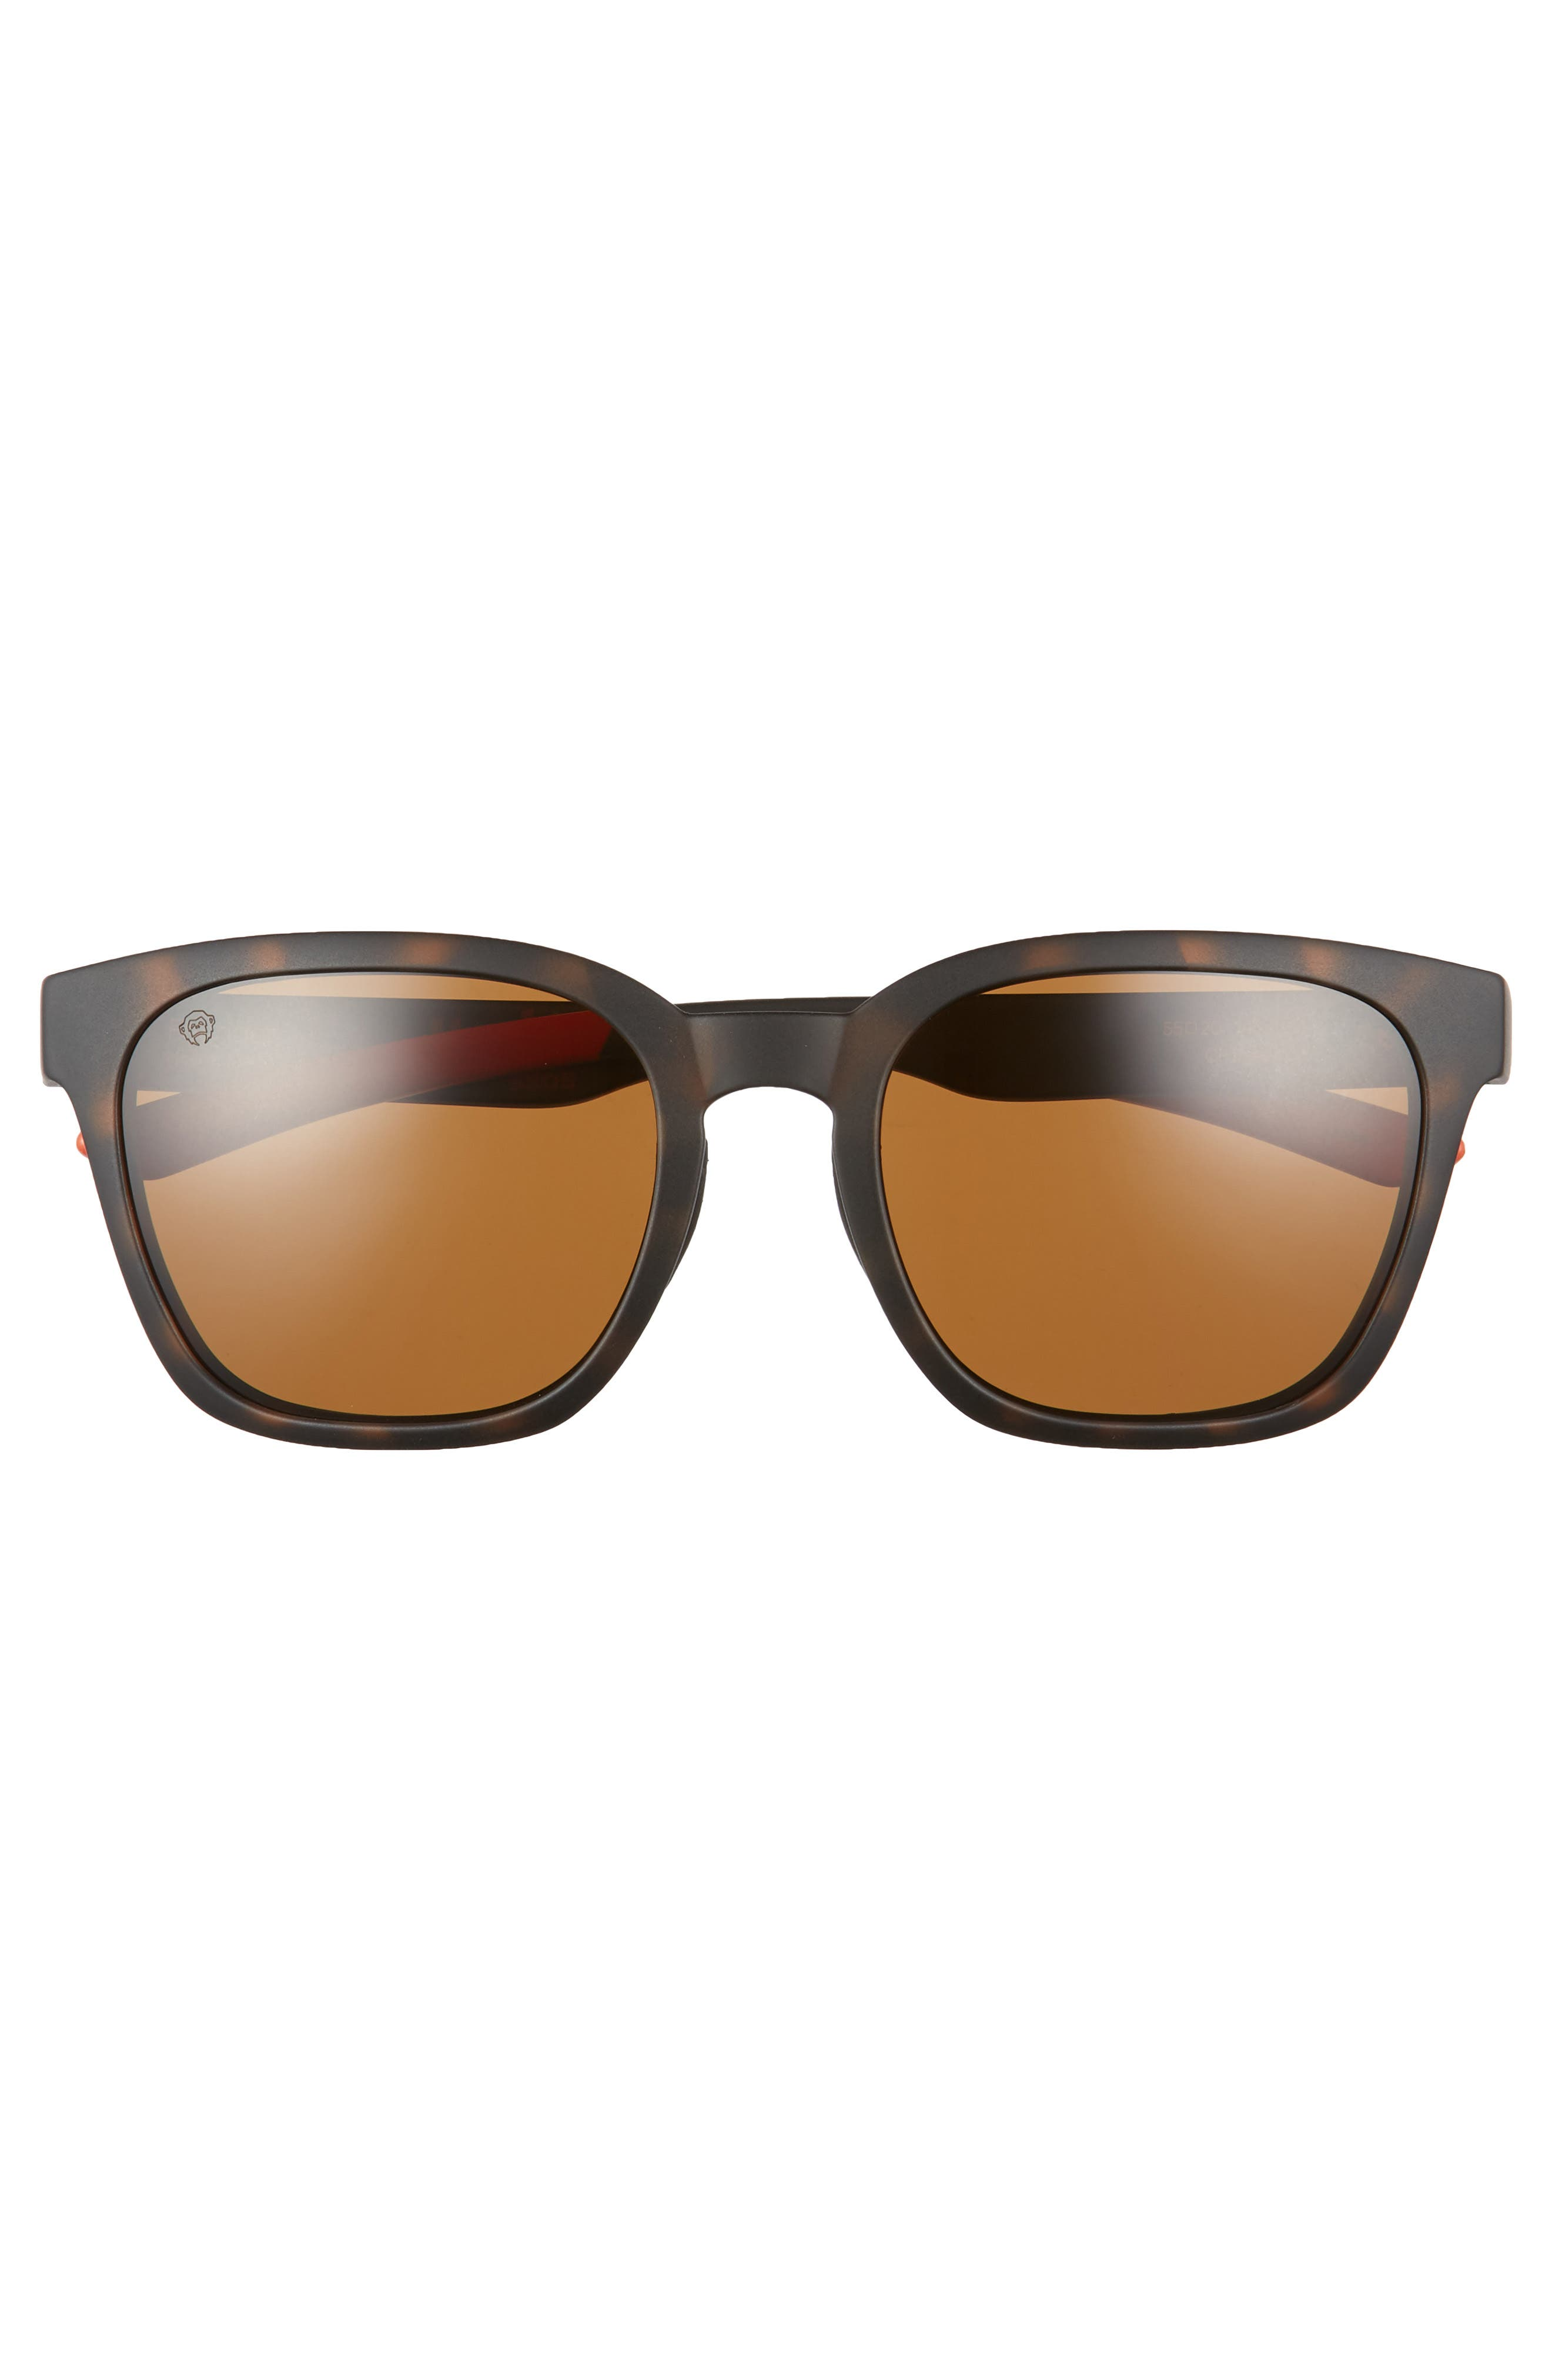 Founder 56mm ChromaPop Polarized Sunglasses,                             Alternate thumbnail 5, color,